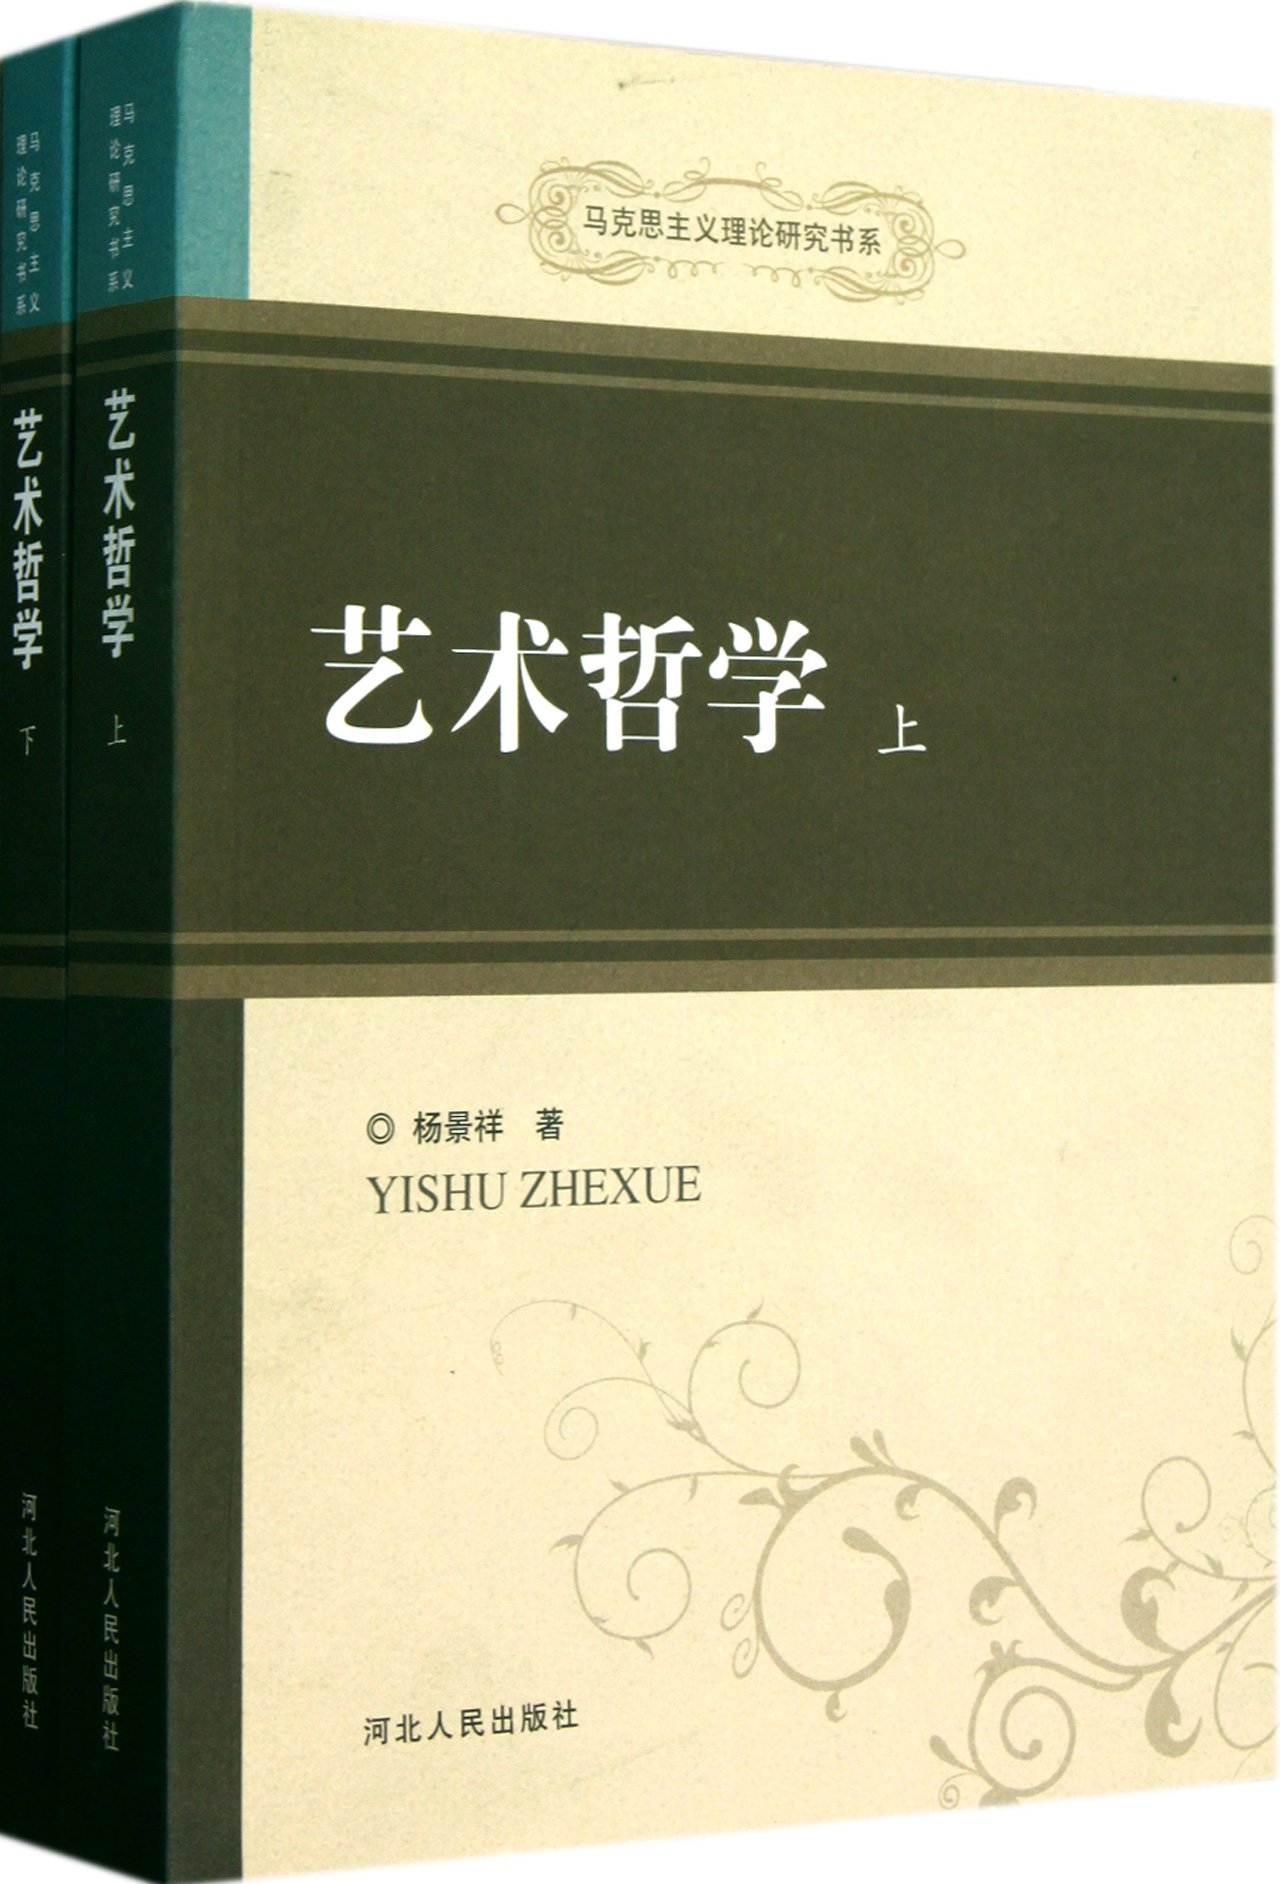 Art Philosophy - Volume I and II (Chinese Edition) PDF ePub book